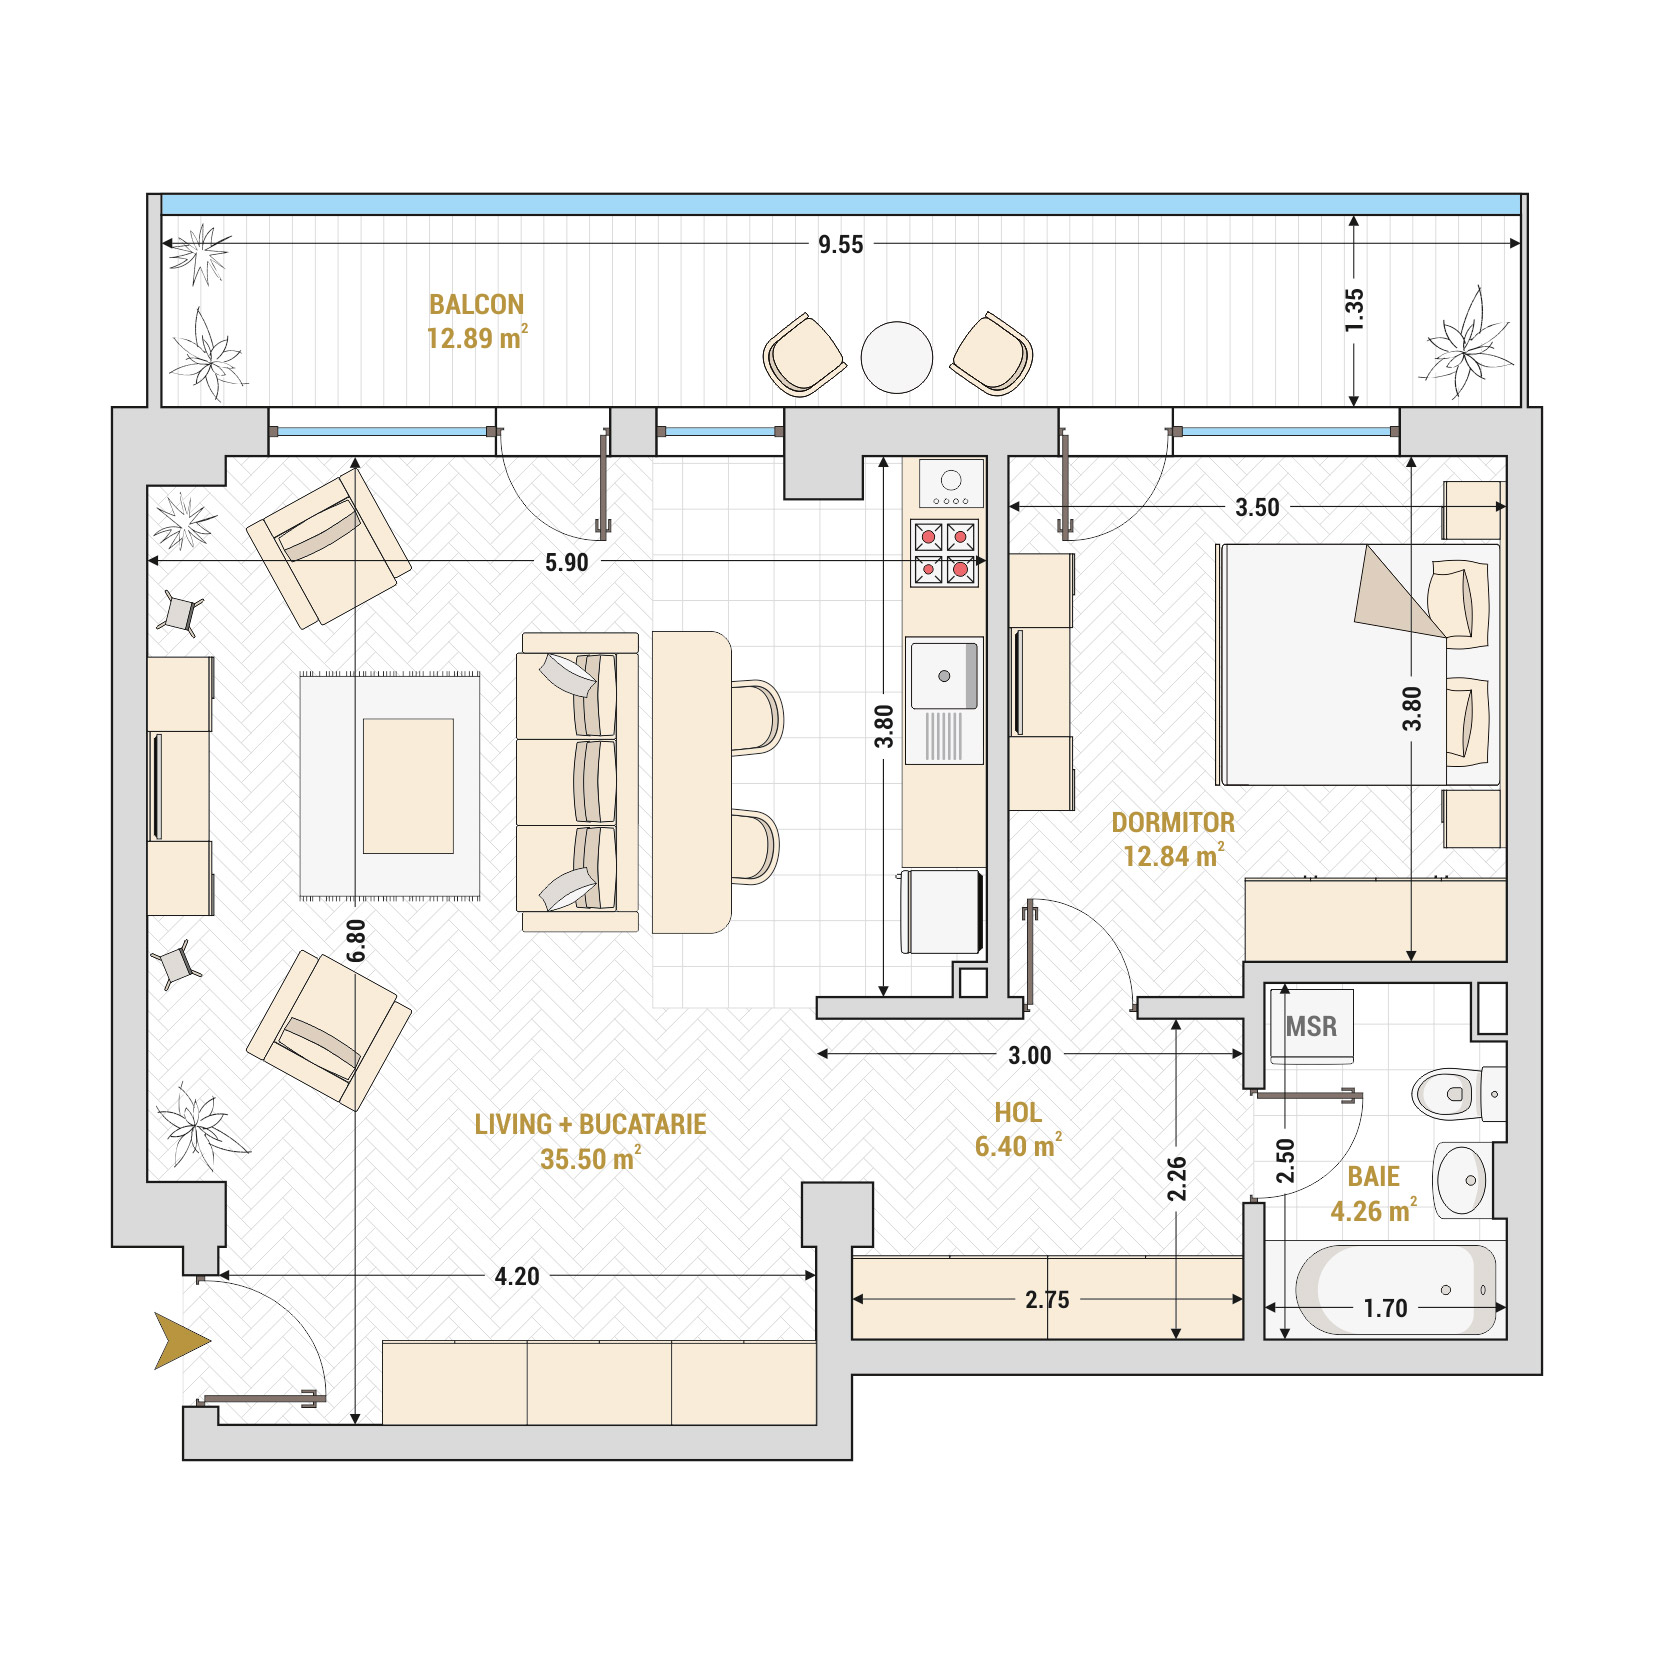 Apartament 2 camere de vanzare Bucuresti - Catedral Residence - Marriott, Piata Unirii, 13 Septembrie, Izvor - Tip 6B - T1